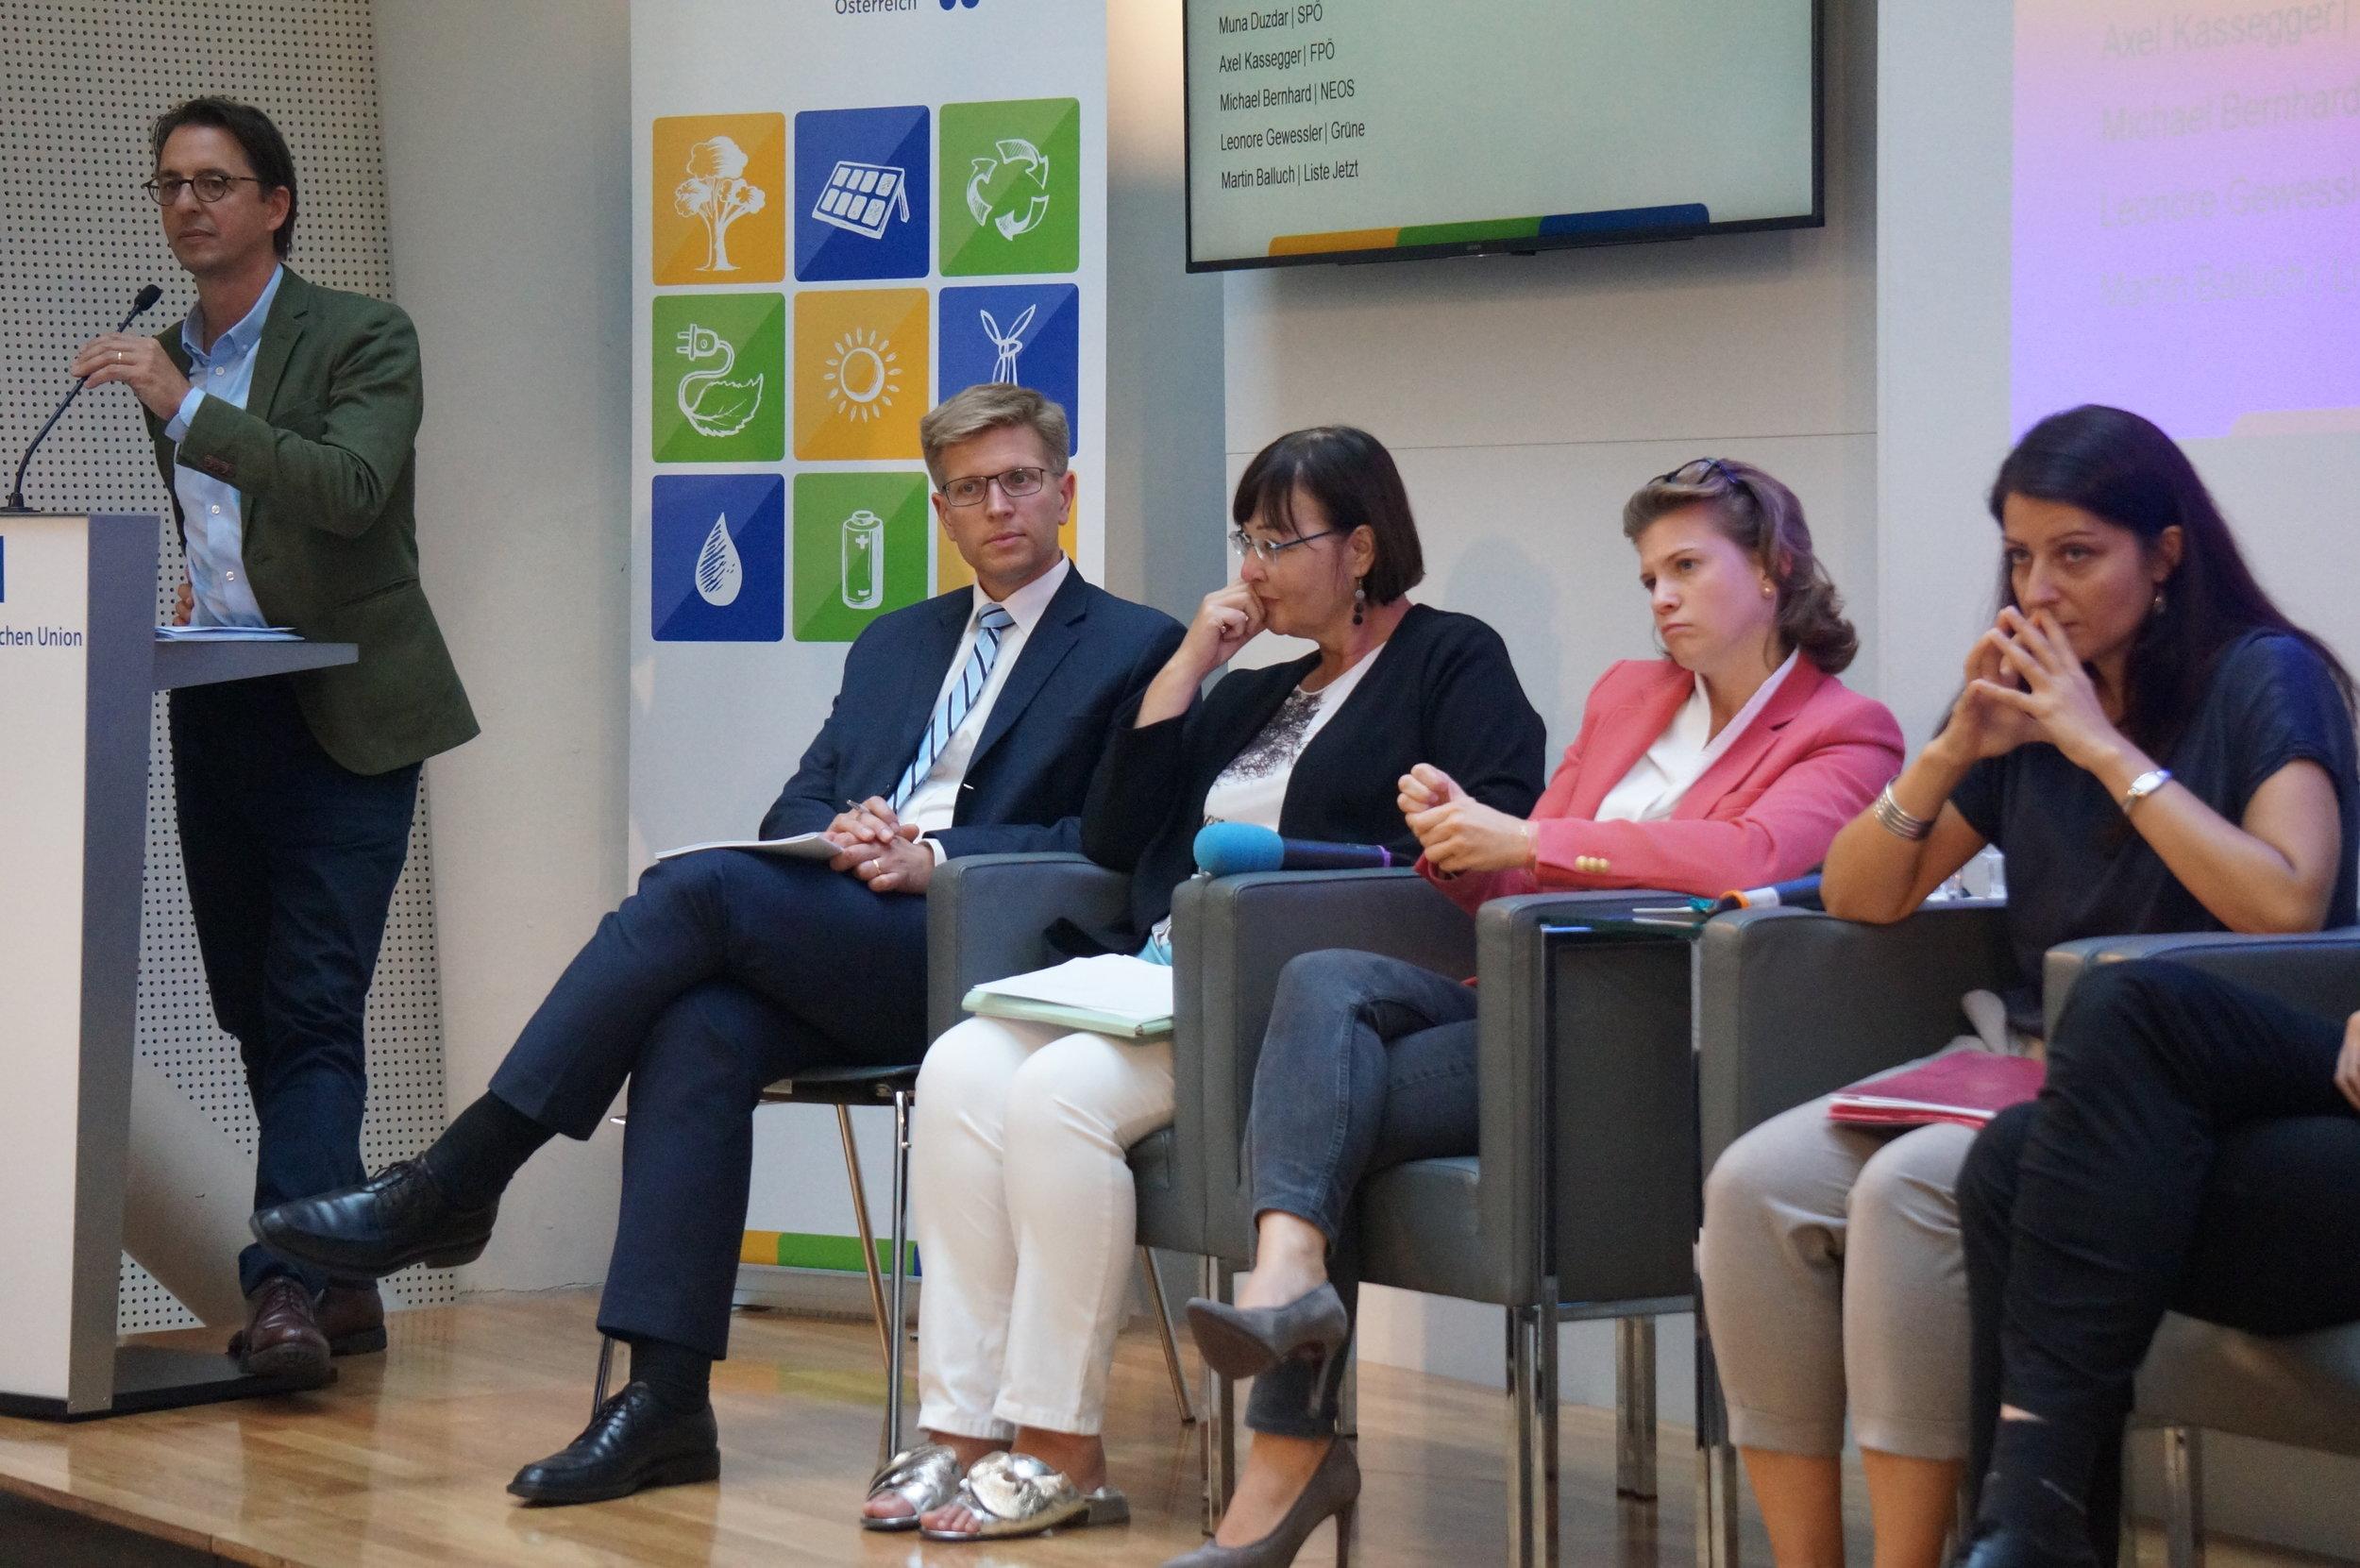 v.li.: Lukas Stühlinger, Thorsten Lenck, Angela Köppl, Elisabeth Olischar und Muna Duzdar